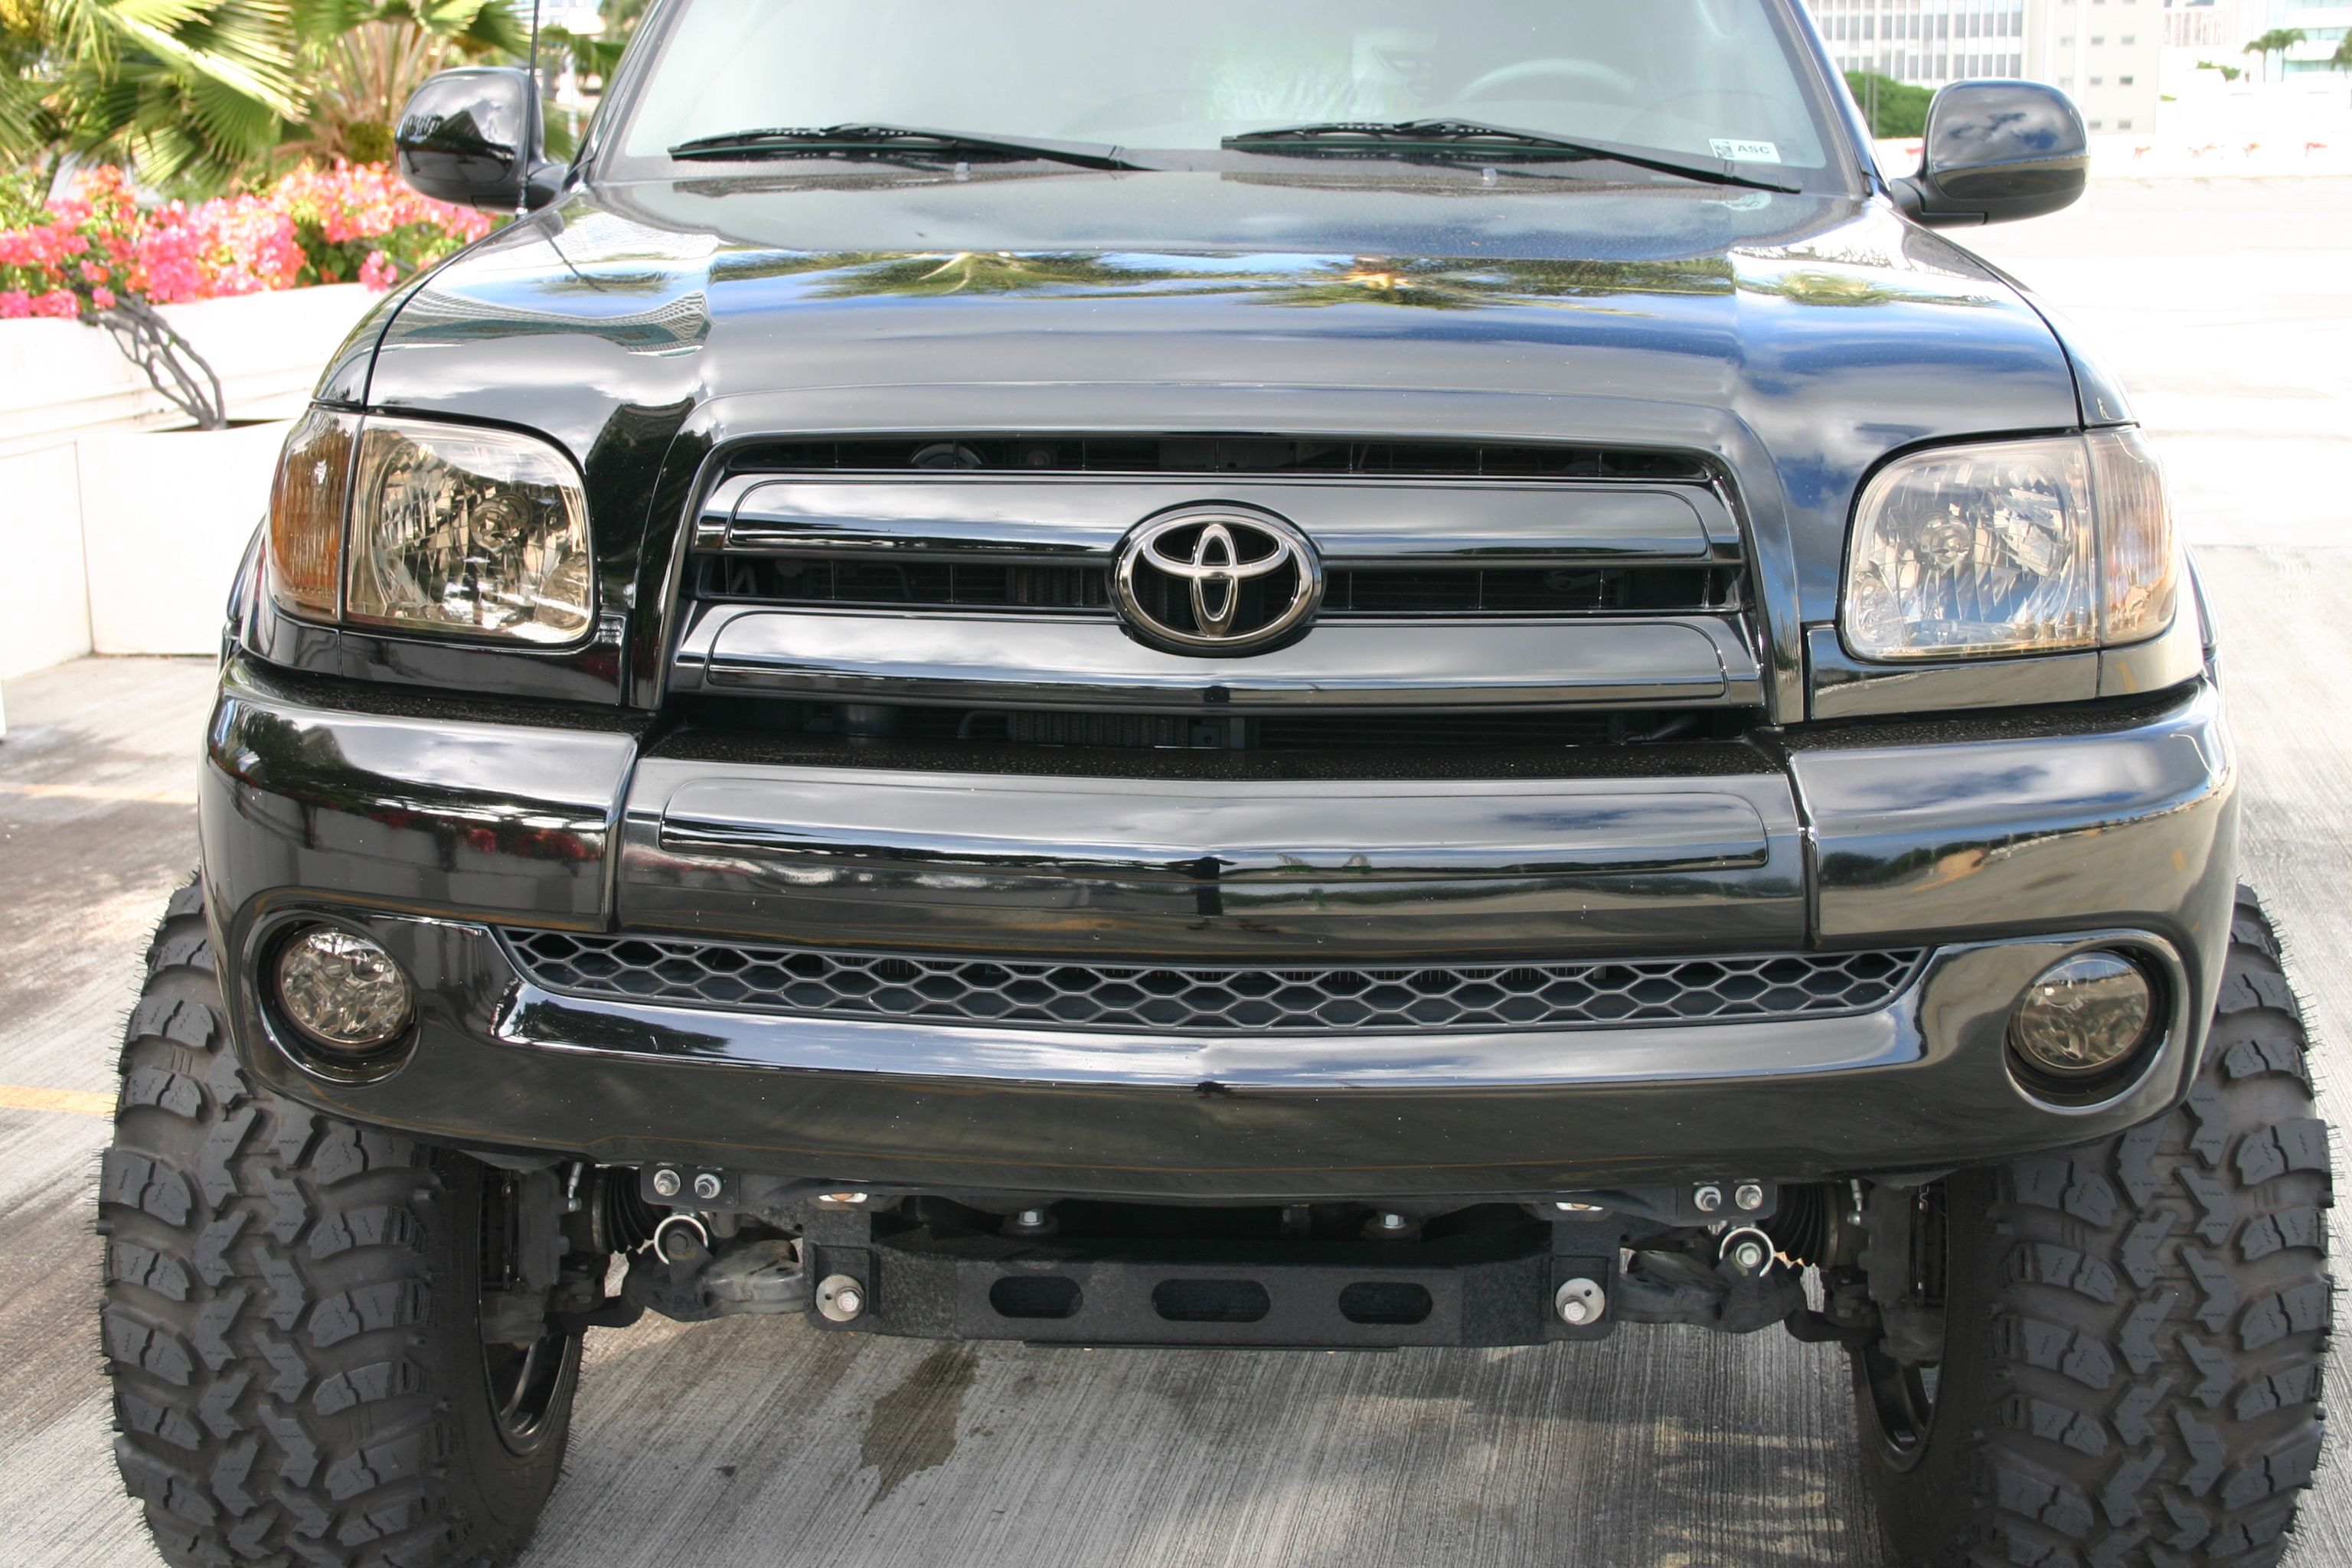 2000 toyota tundra 6 inch lift Google Search Toyota